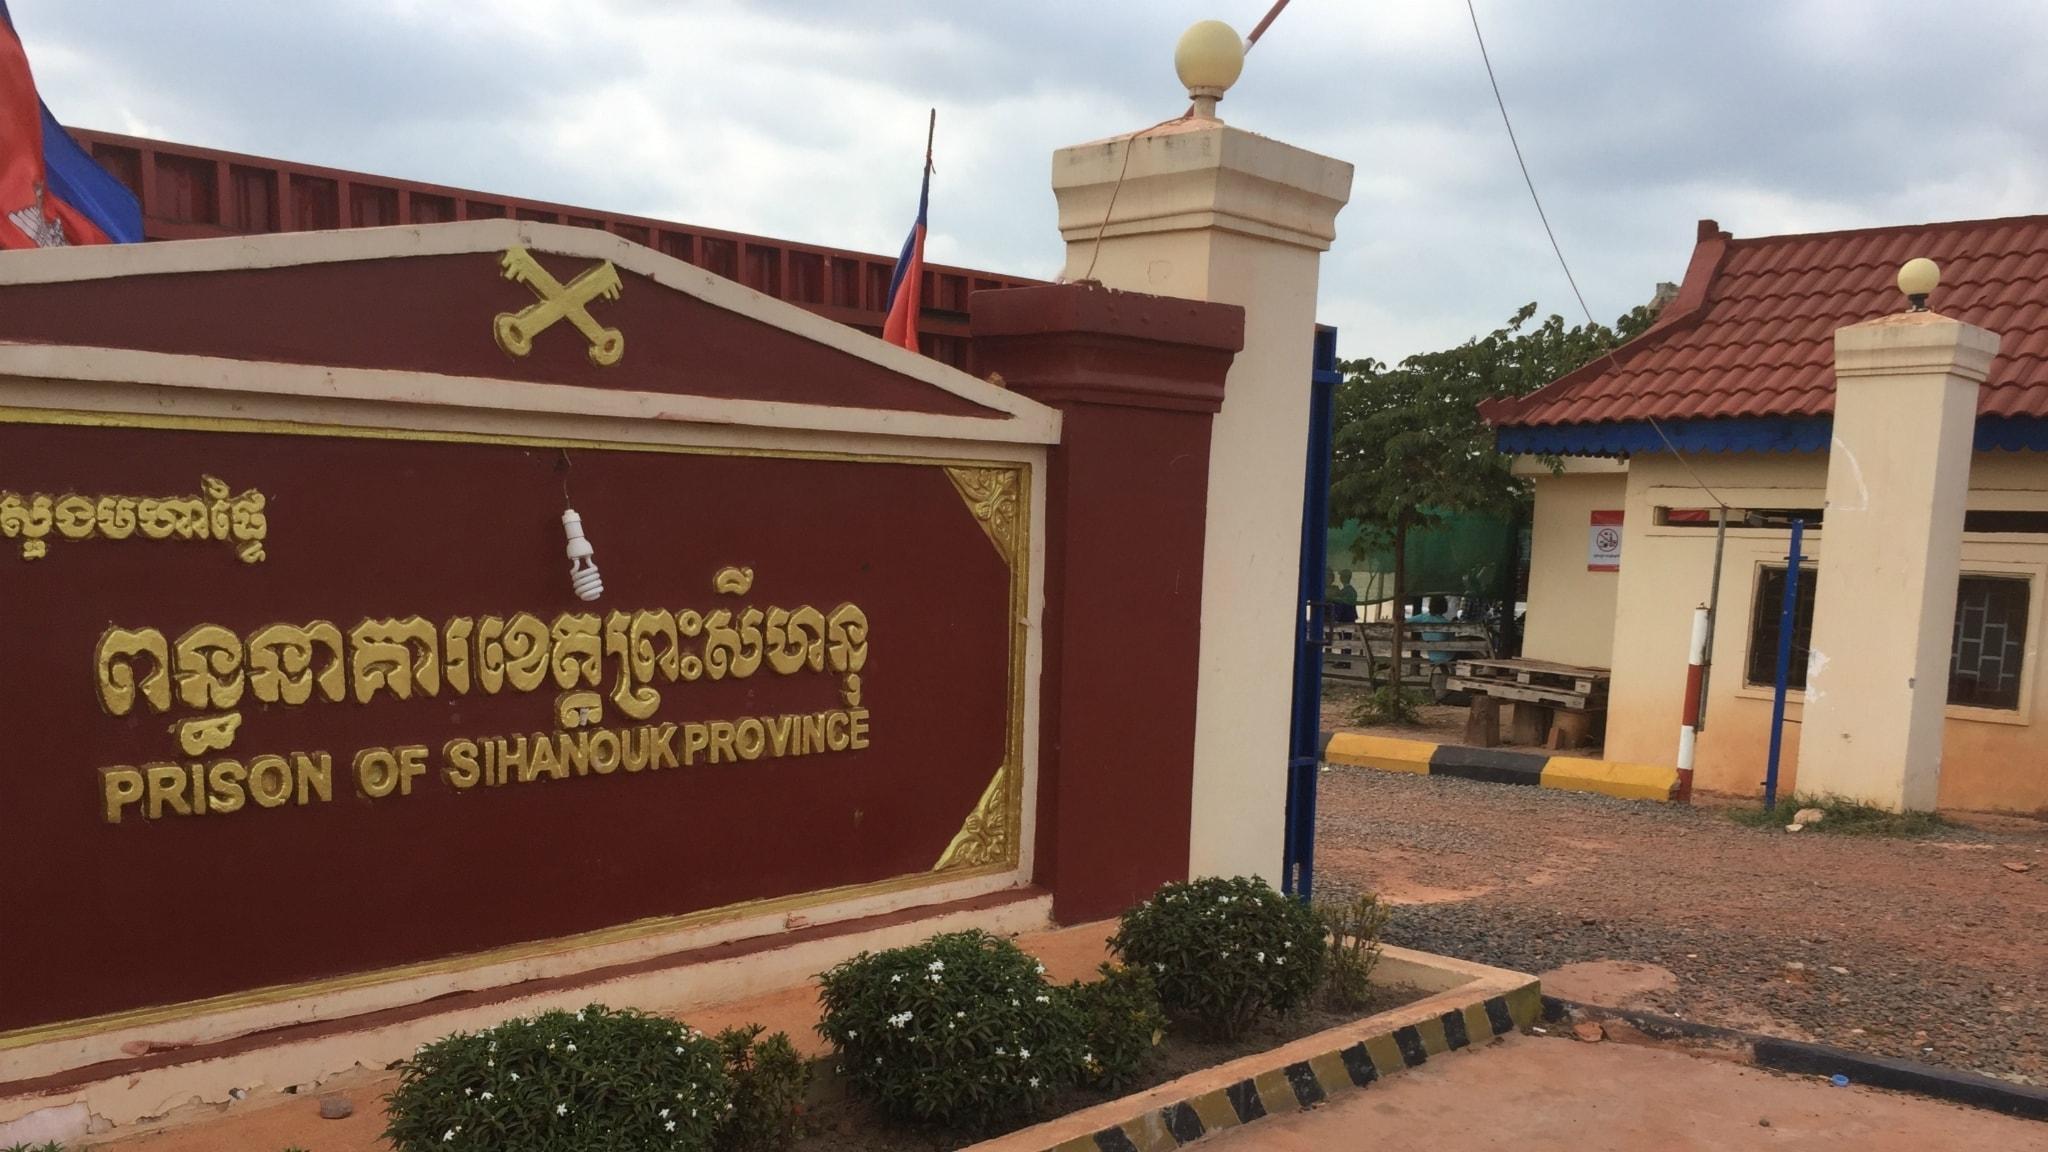 Anders bakom galler i Kambodja: